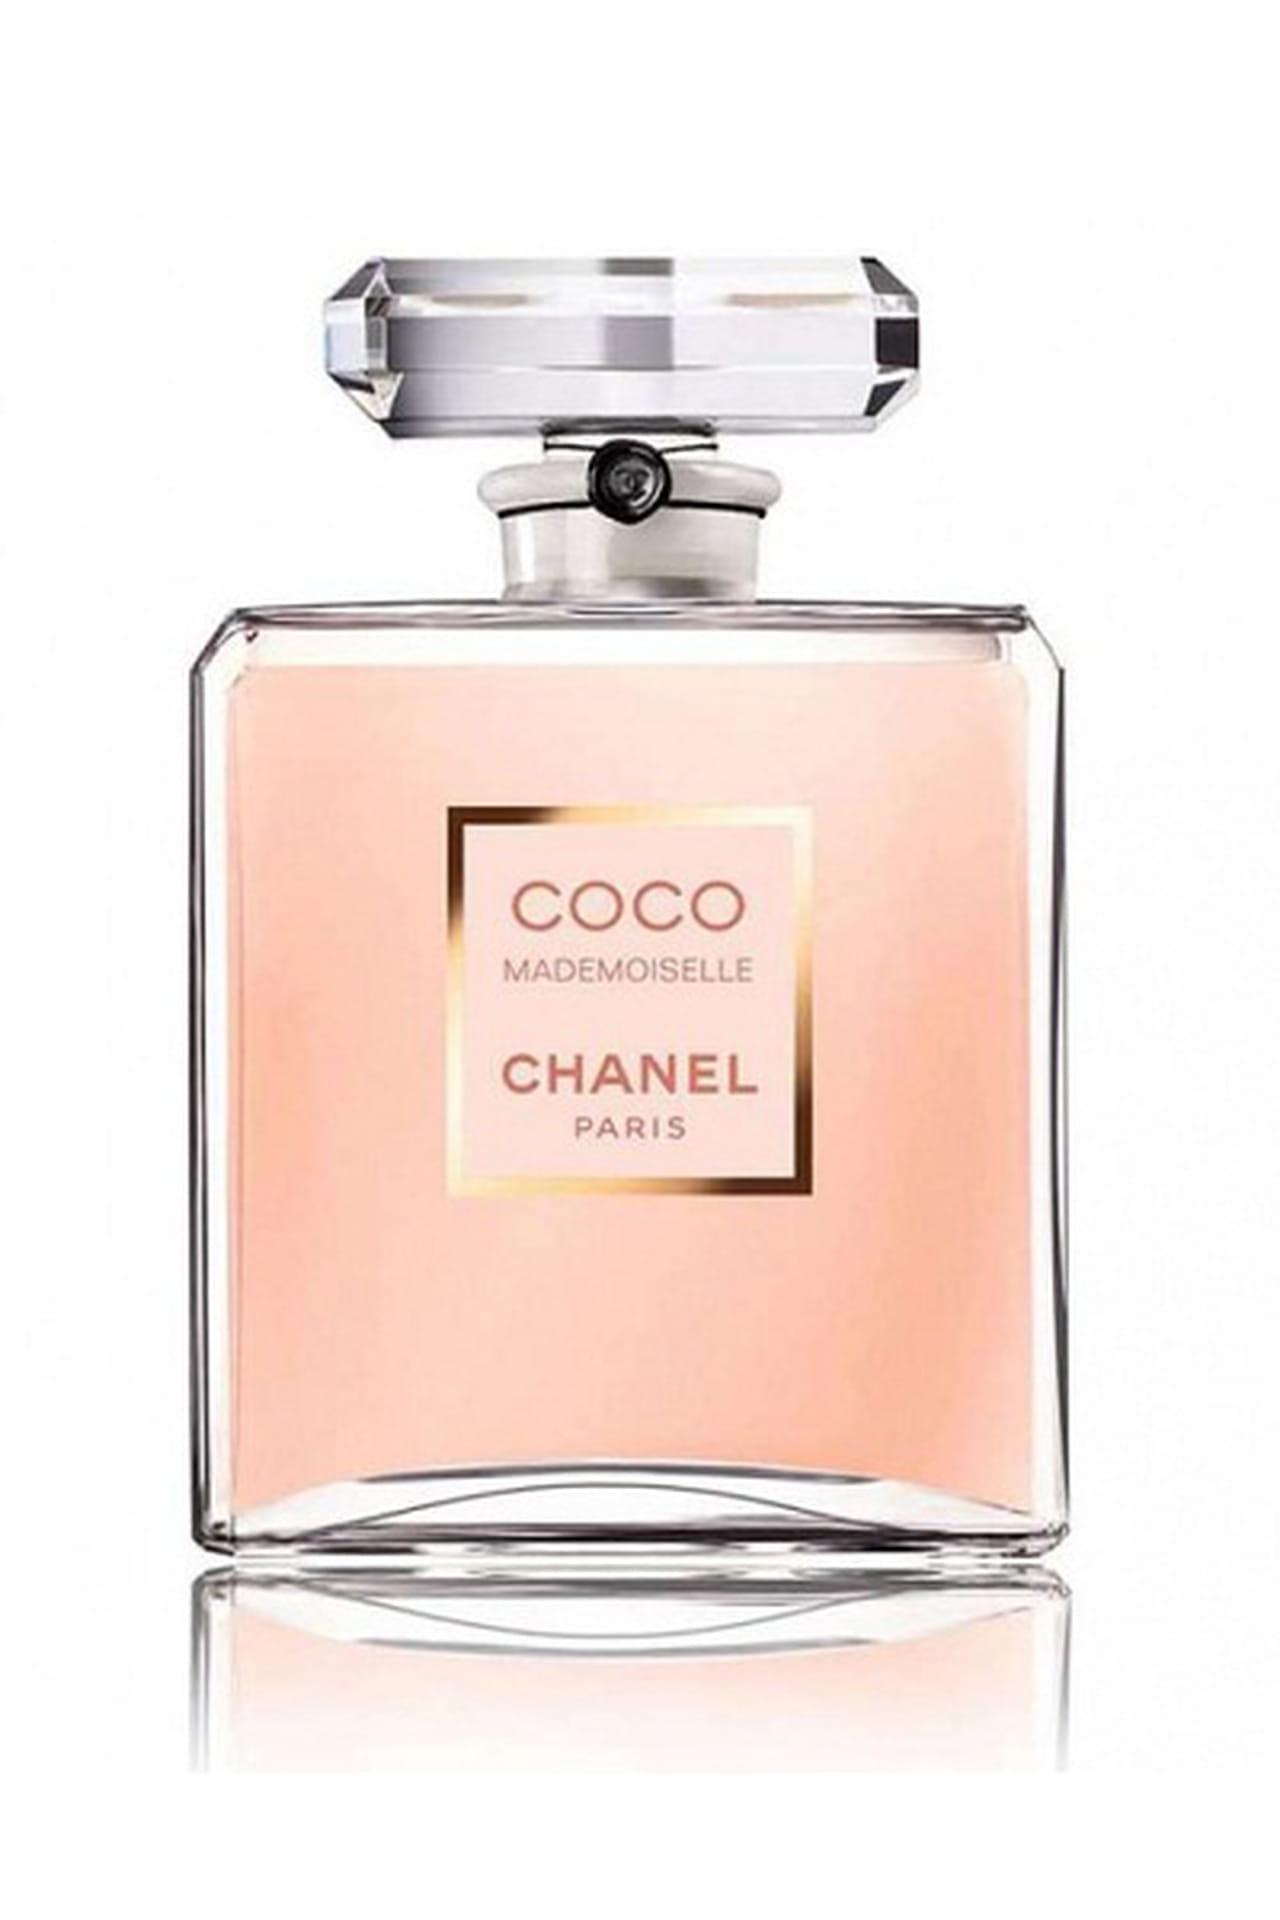 8ff1850b8a39e Coco Chanel عطر يترك انطباع لا يُقاوم.